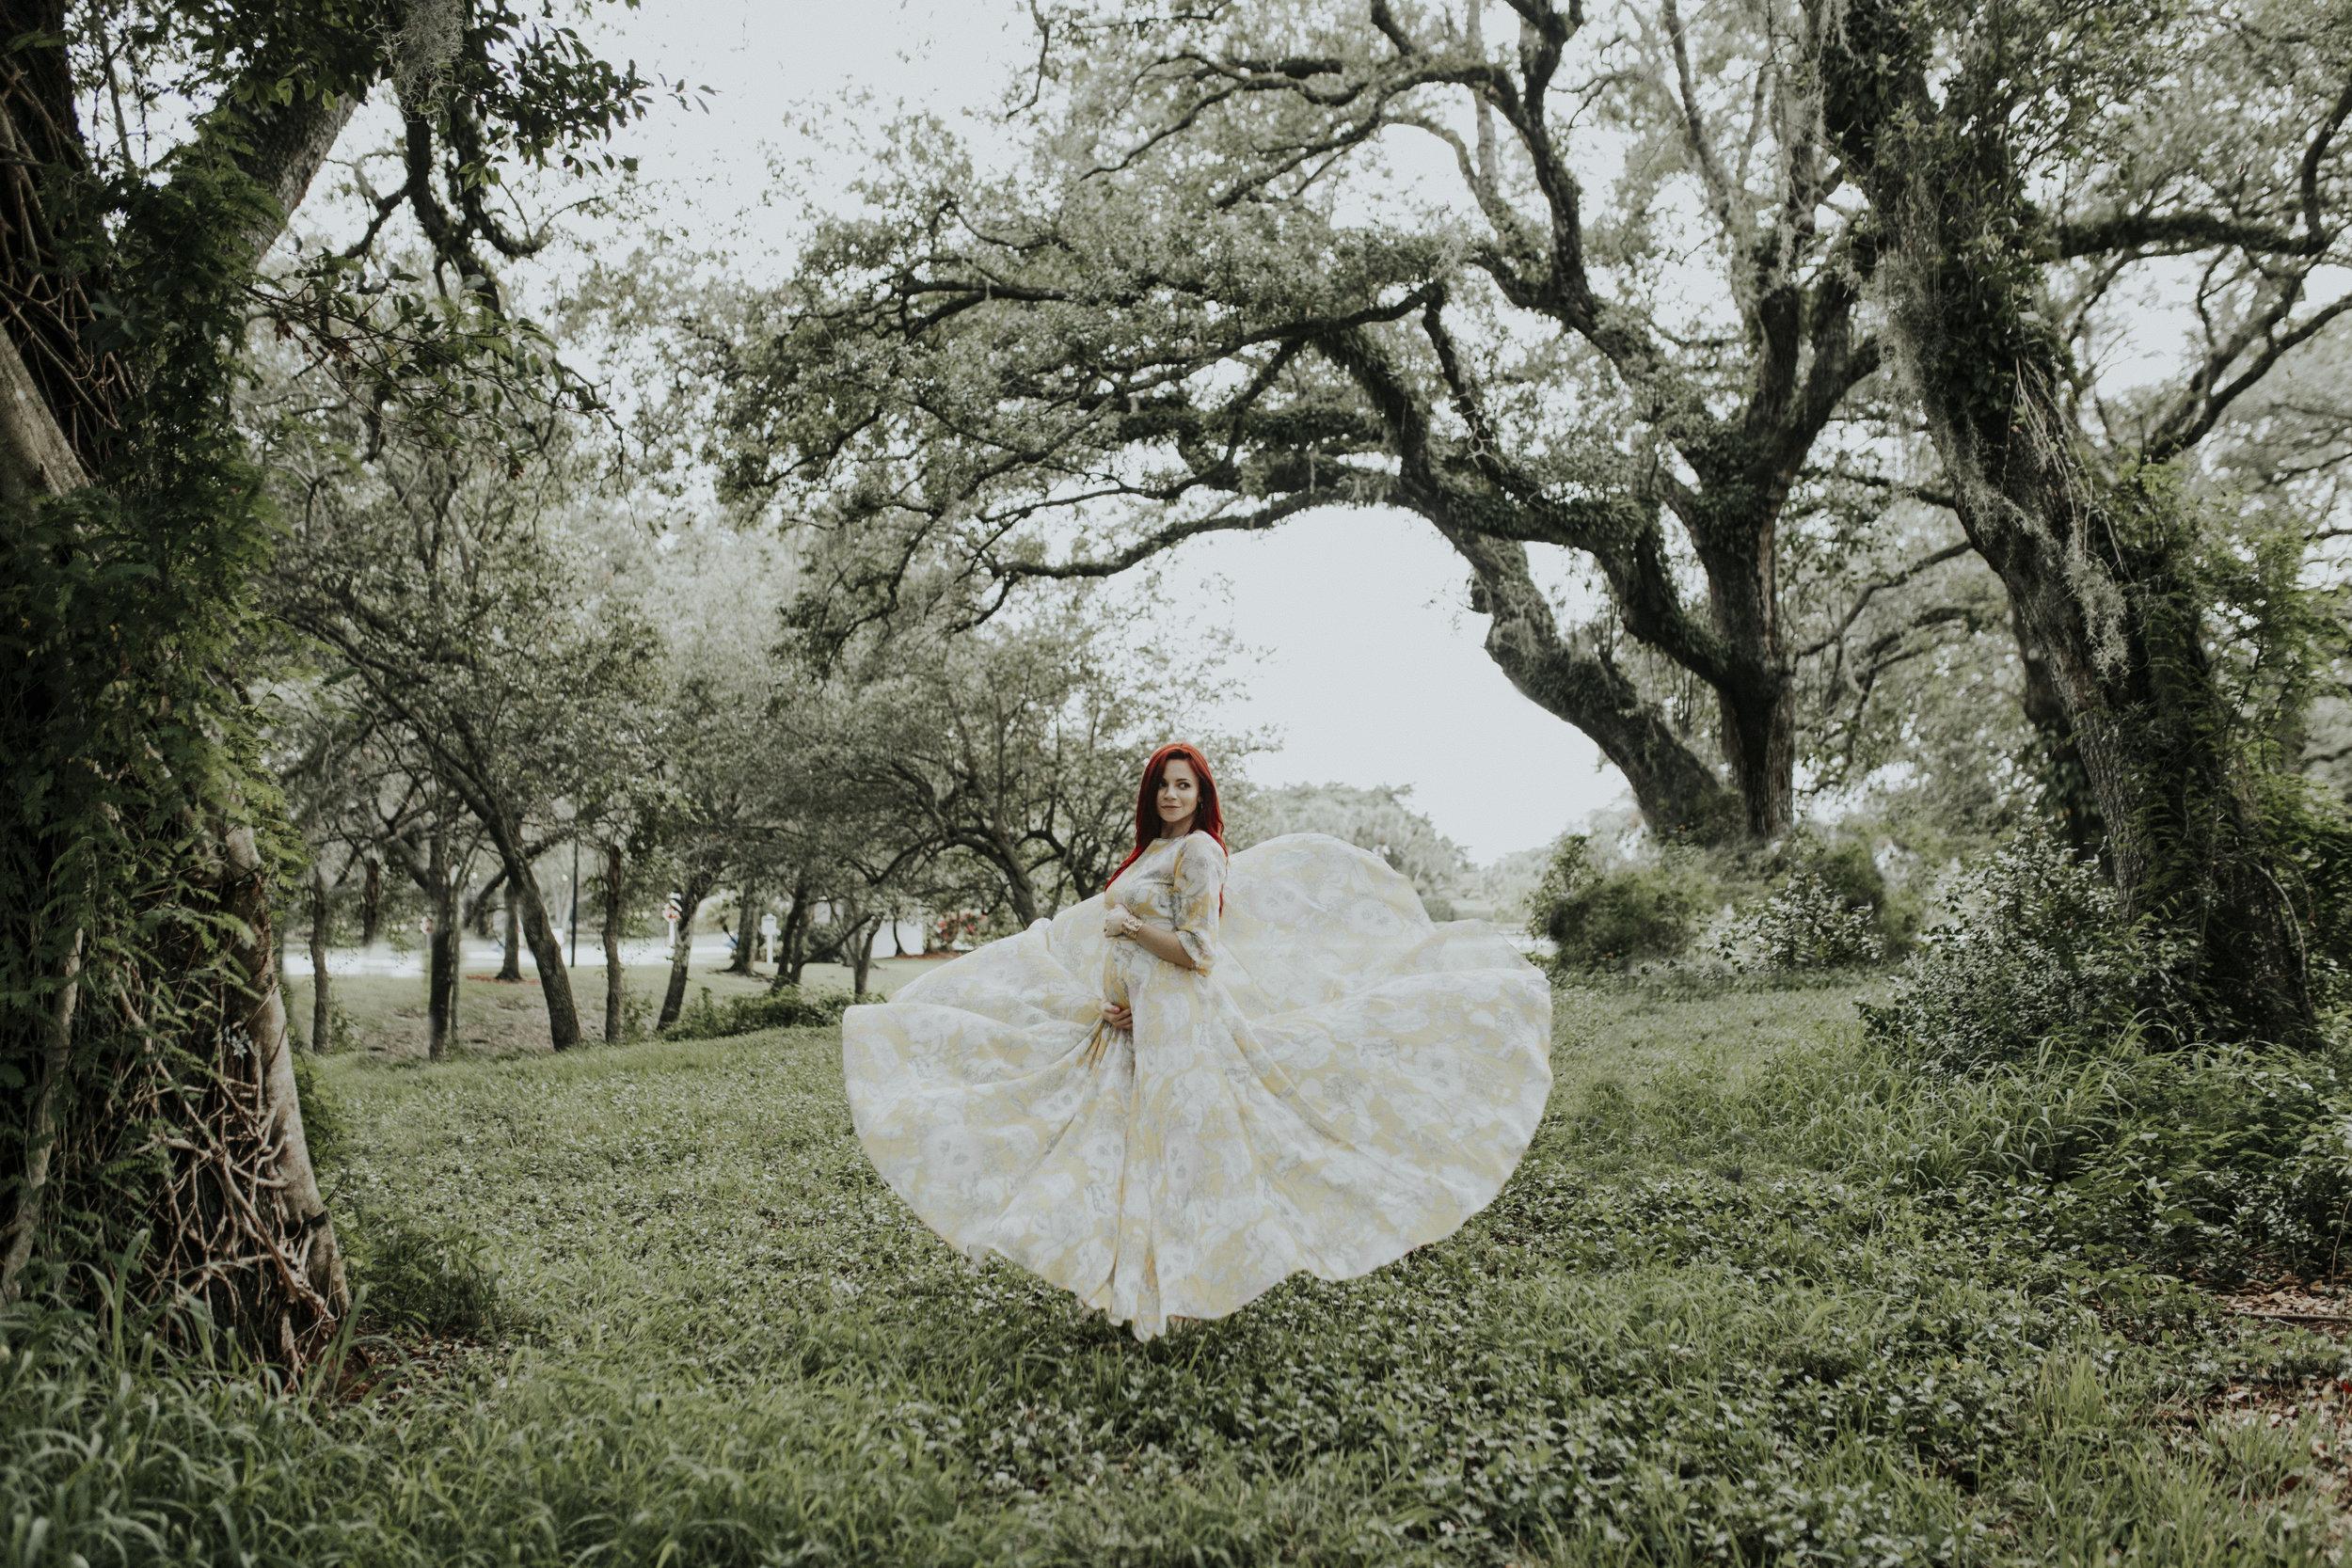 Tree-Tops-Park-Davie-Florida-Maternity-photography